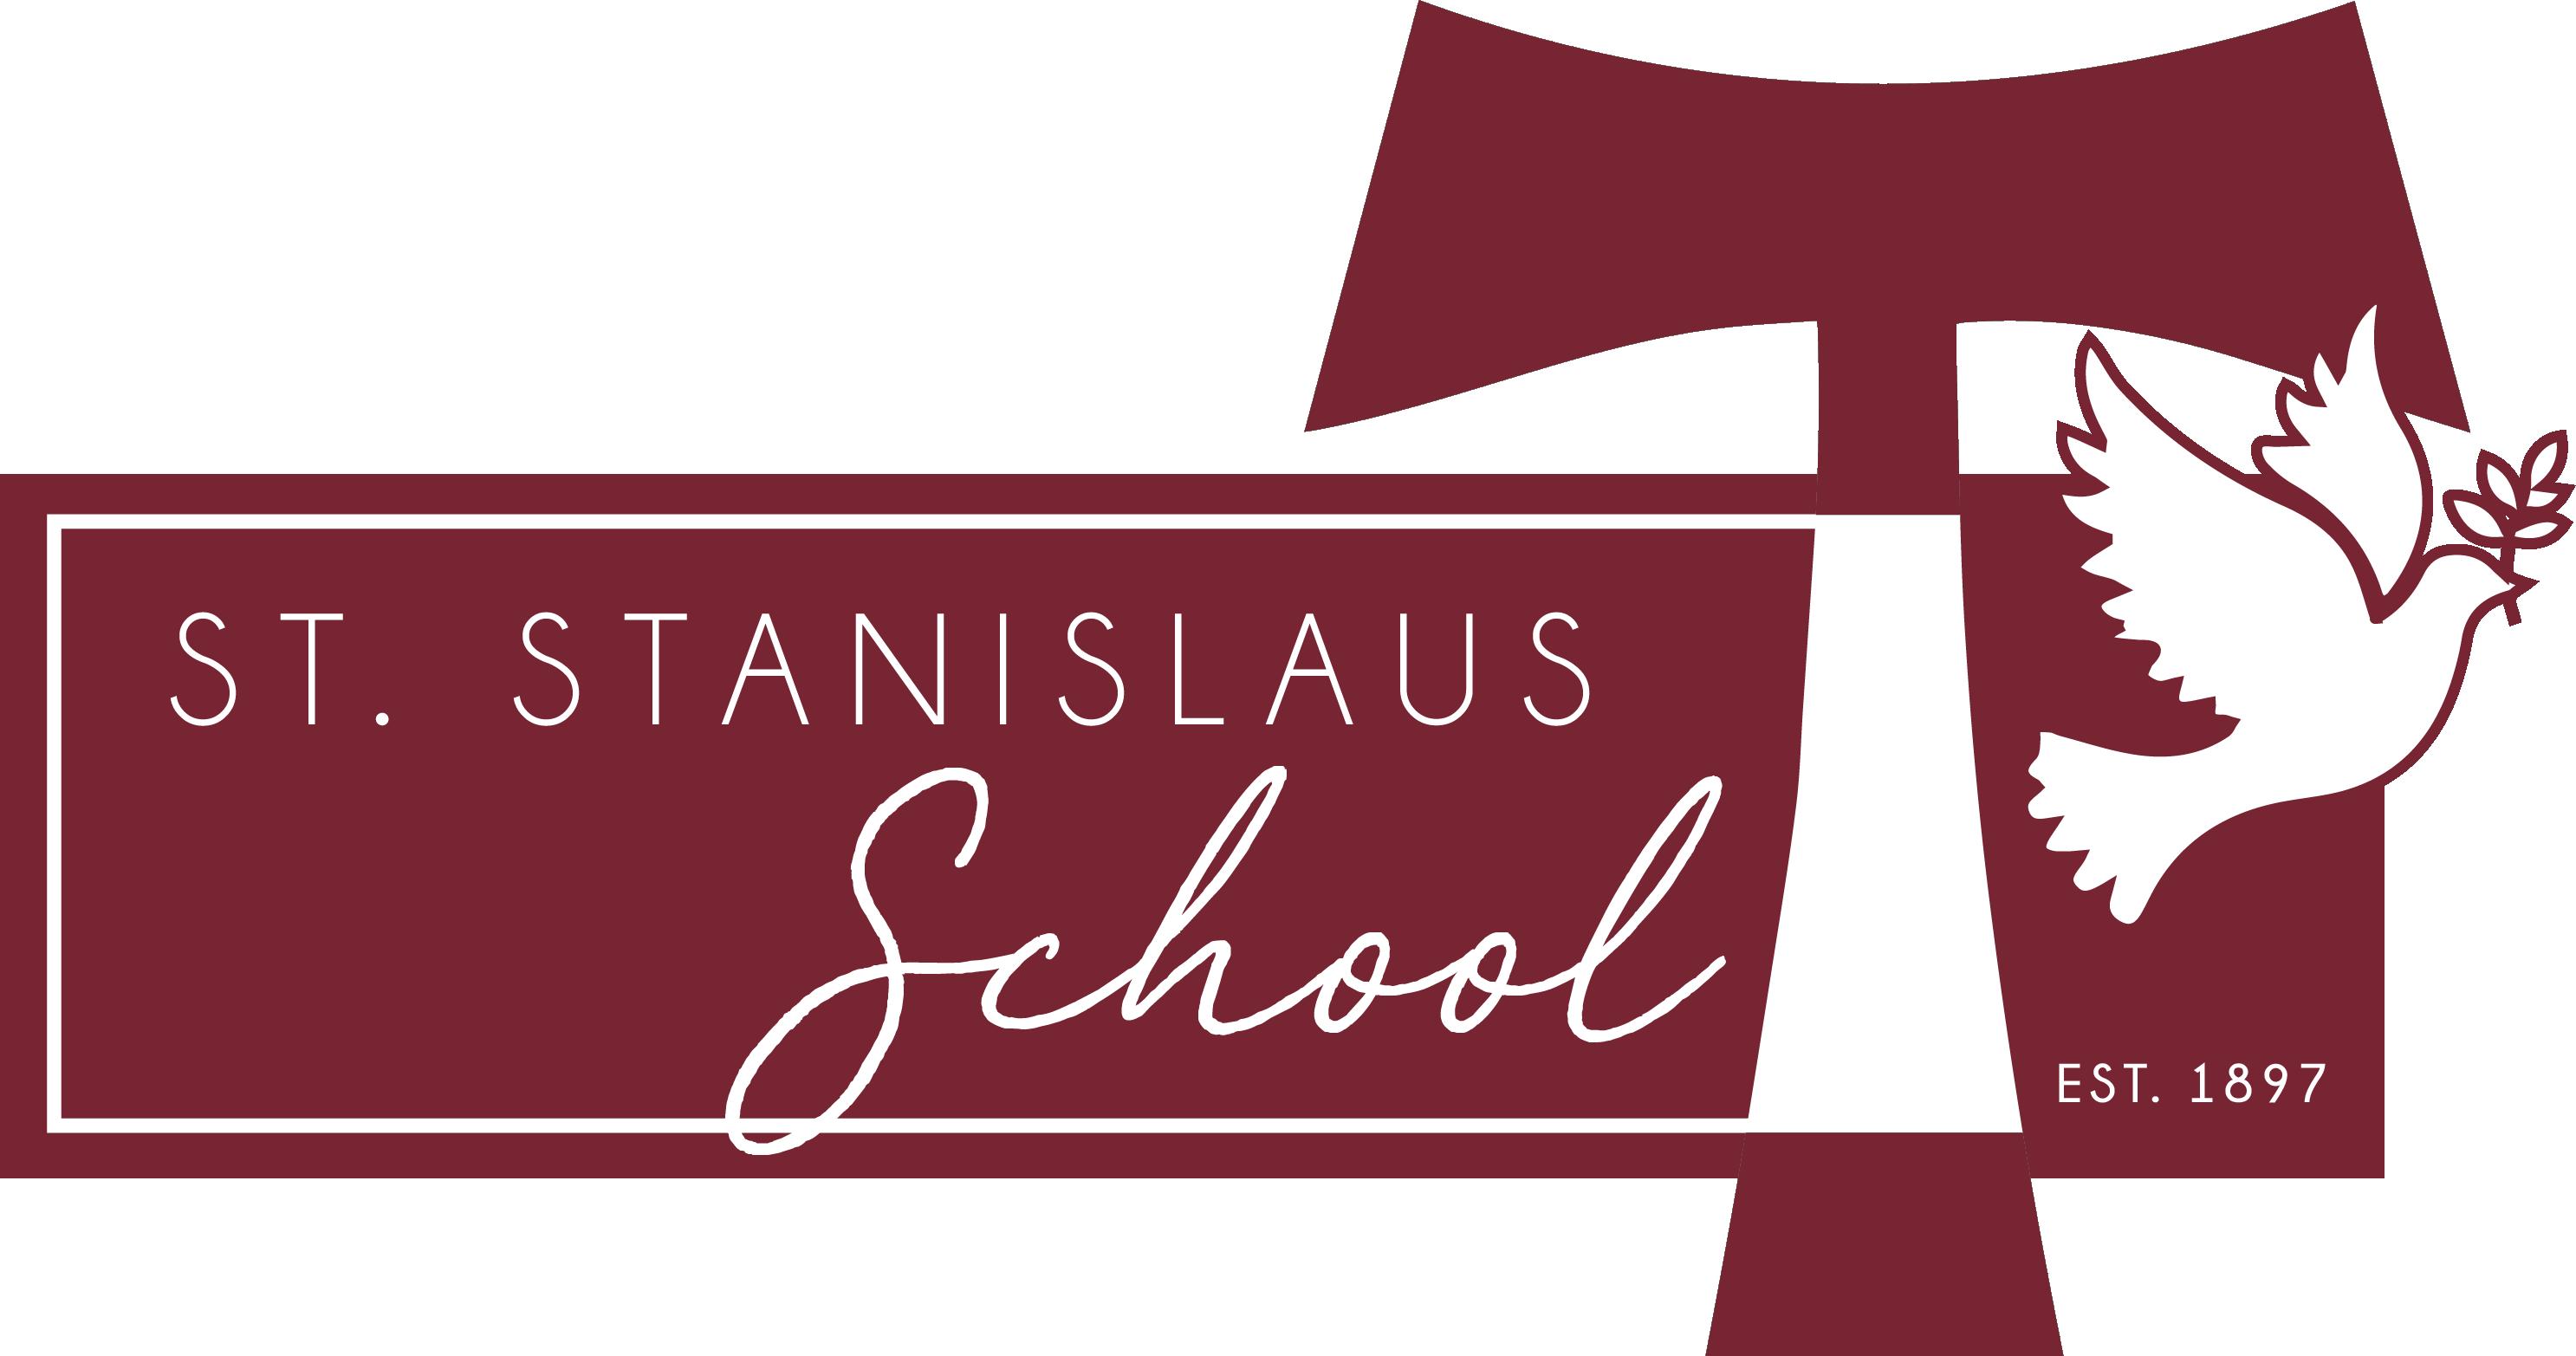 St. Stanislaus School logo